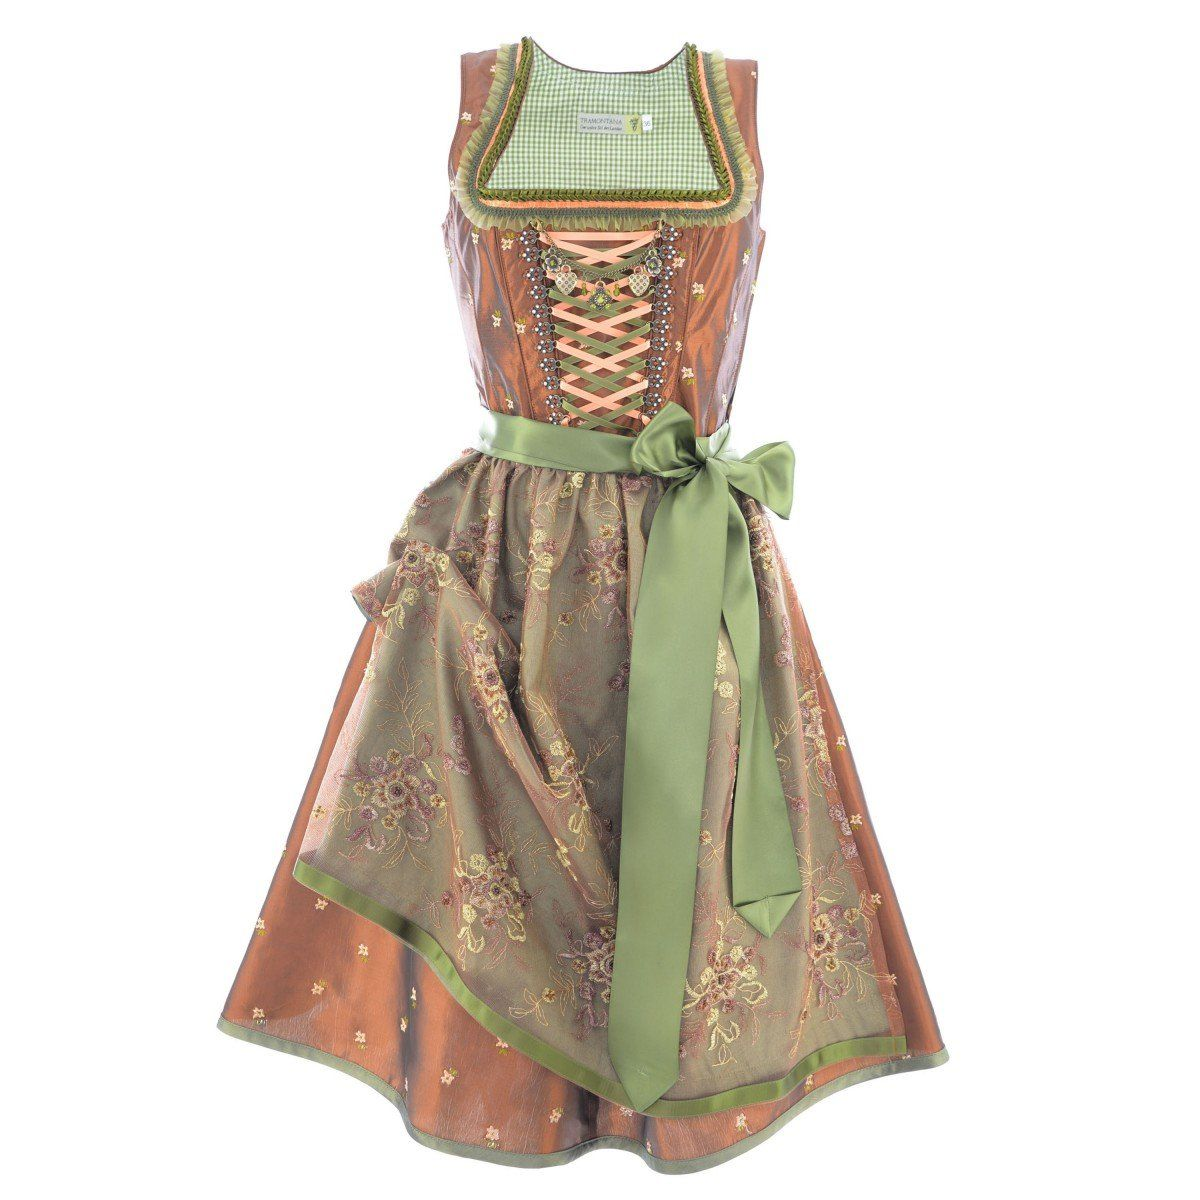 Midi Dirndl Walla in bronze by Tramontana, size: 32; color: Bronze: Amazon.de: Clothing